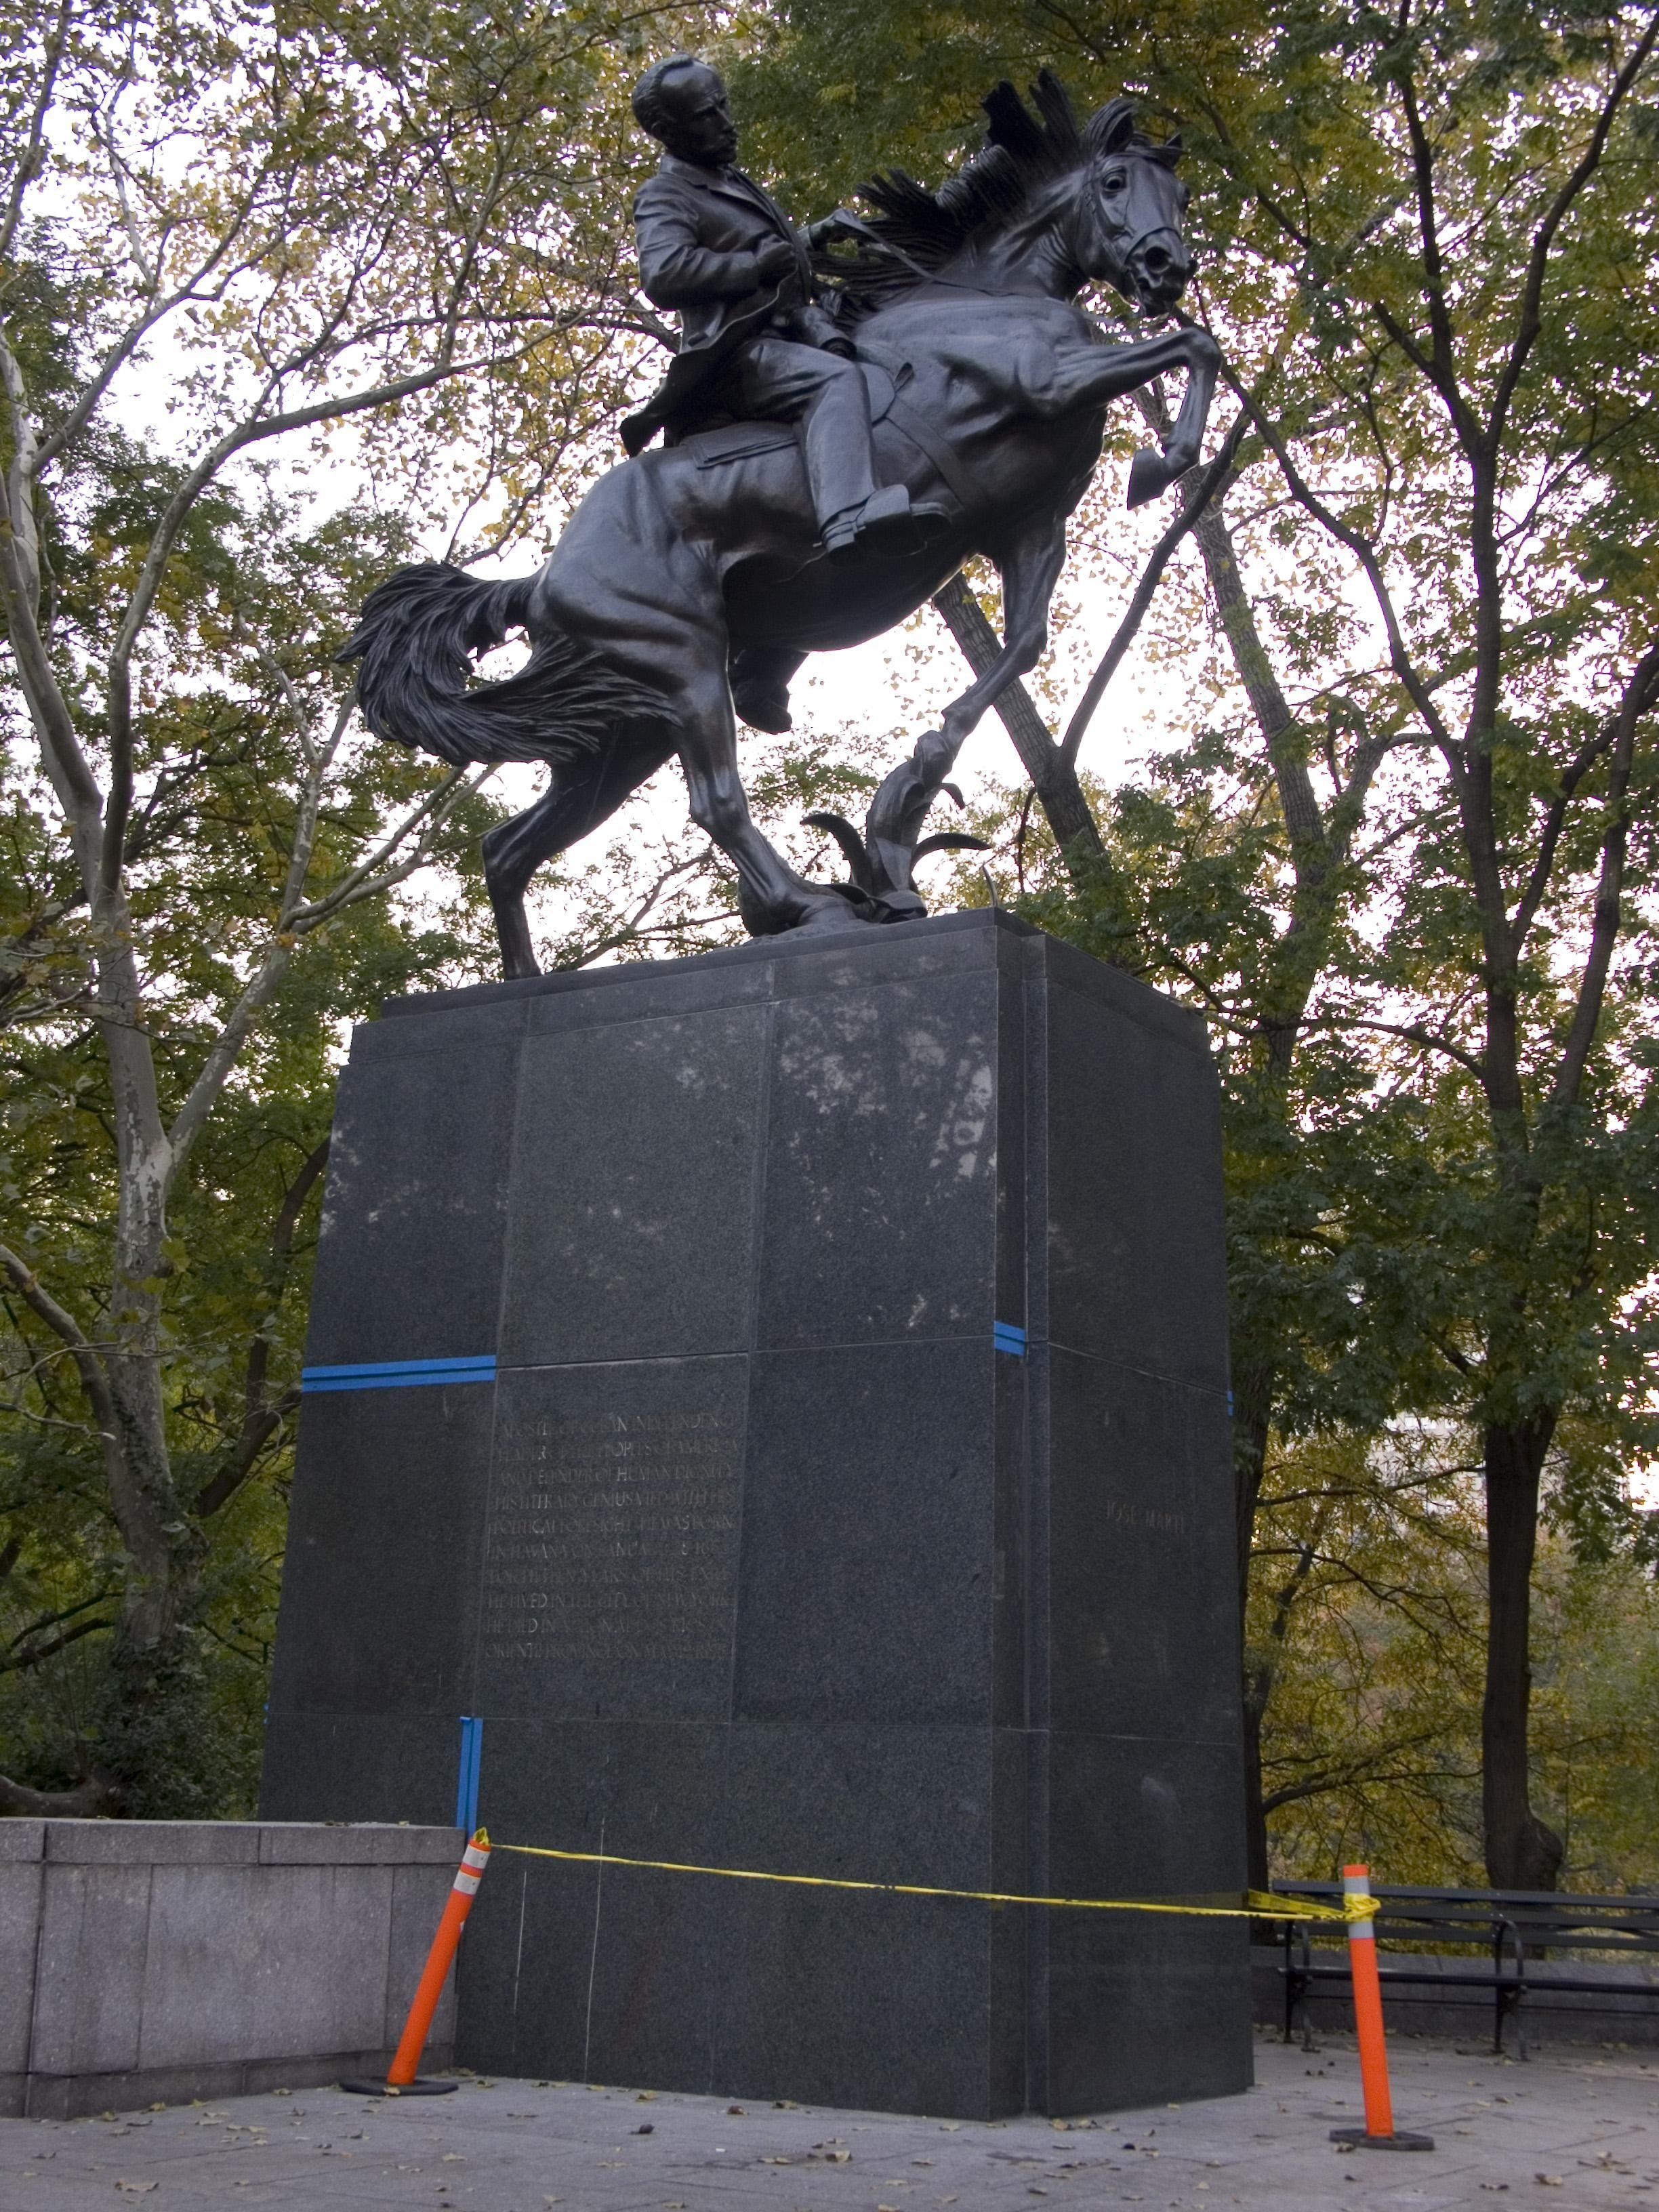 Jose Marti Monument By Anna Hyatt Huntington Central Park New York City New York Monument Equine Inspiration Equestrian Statue